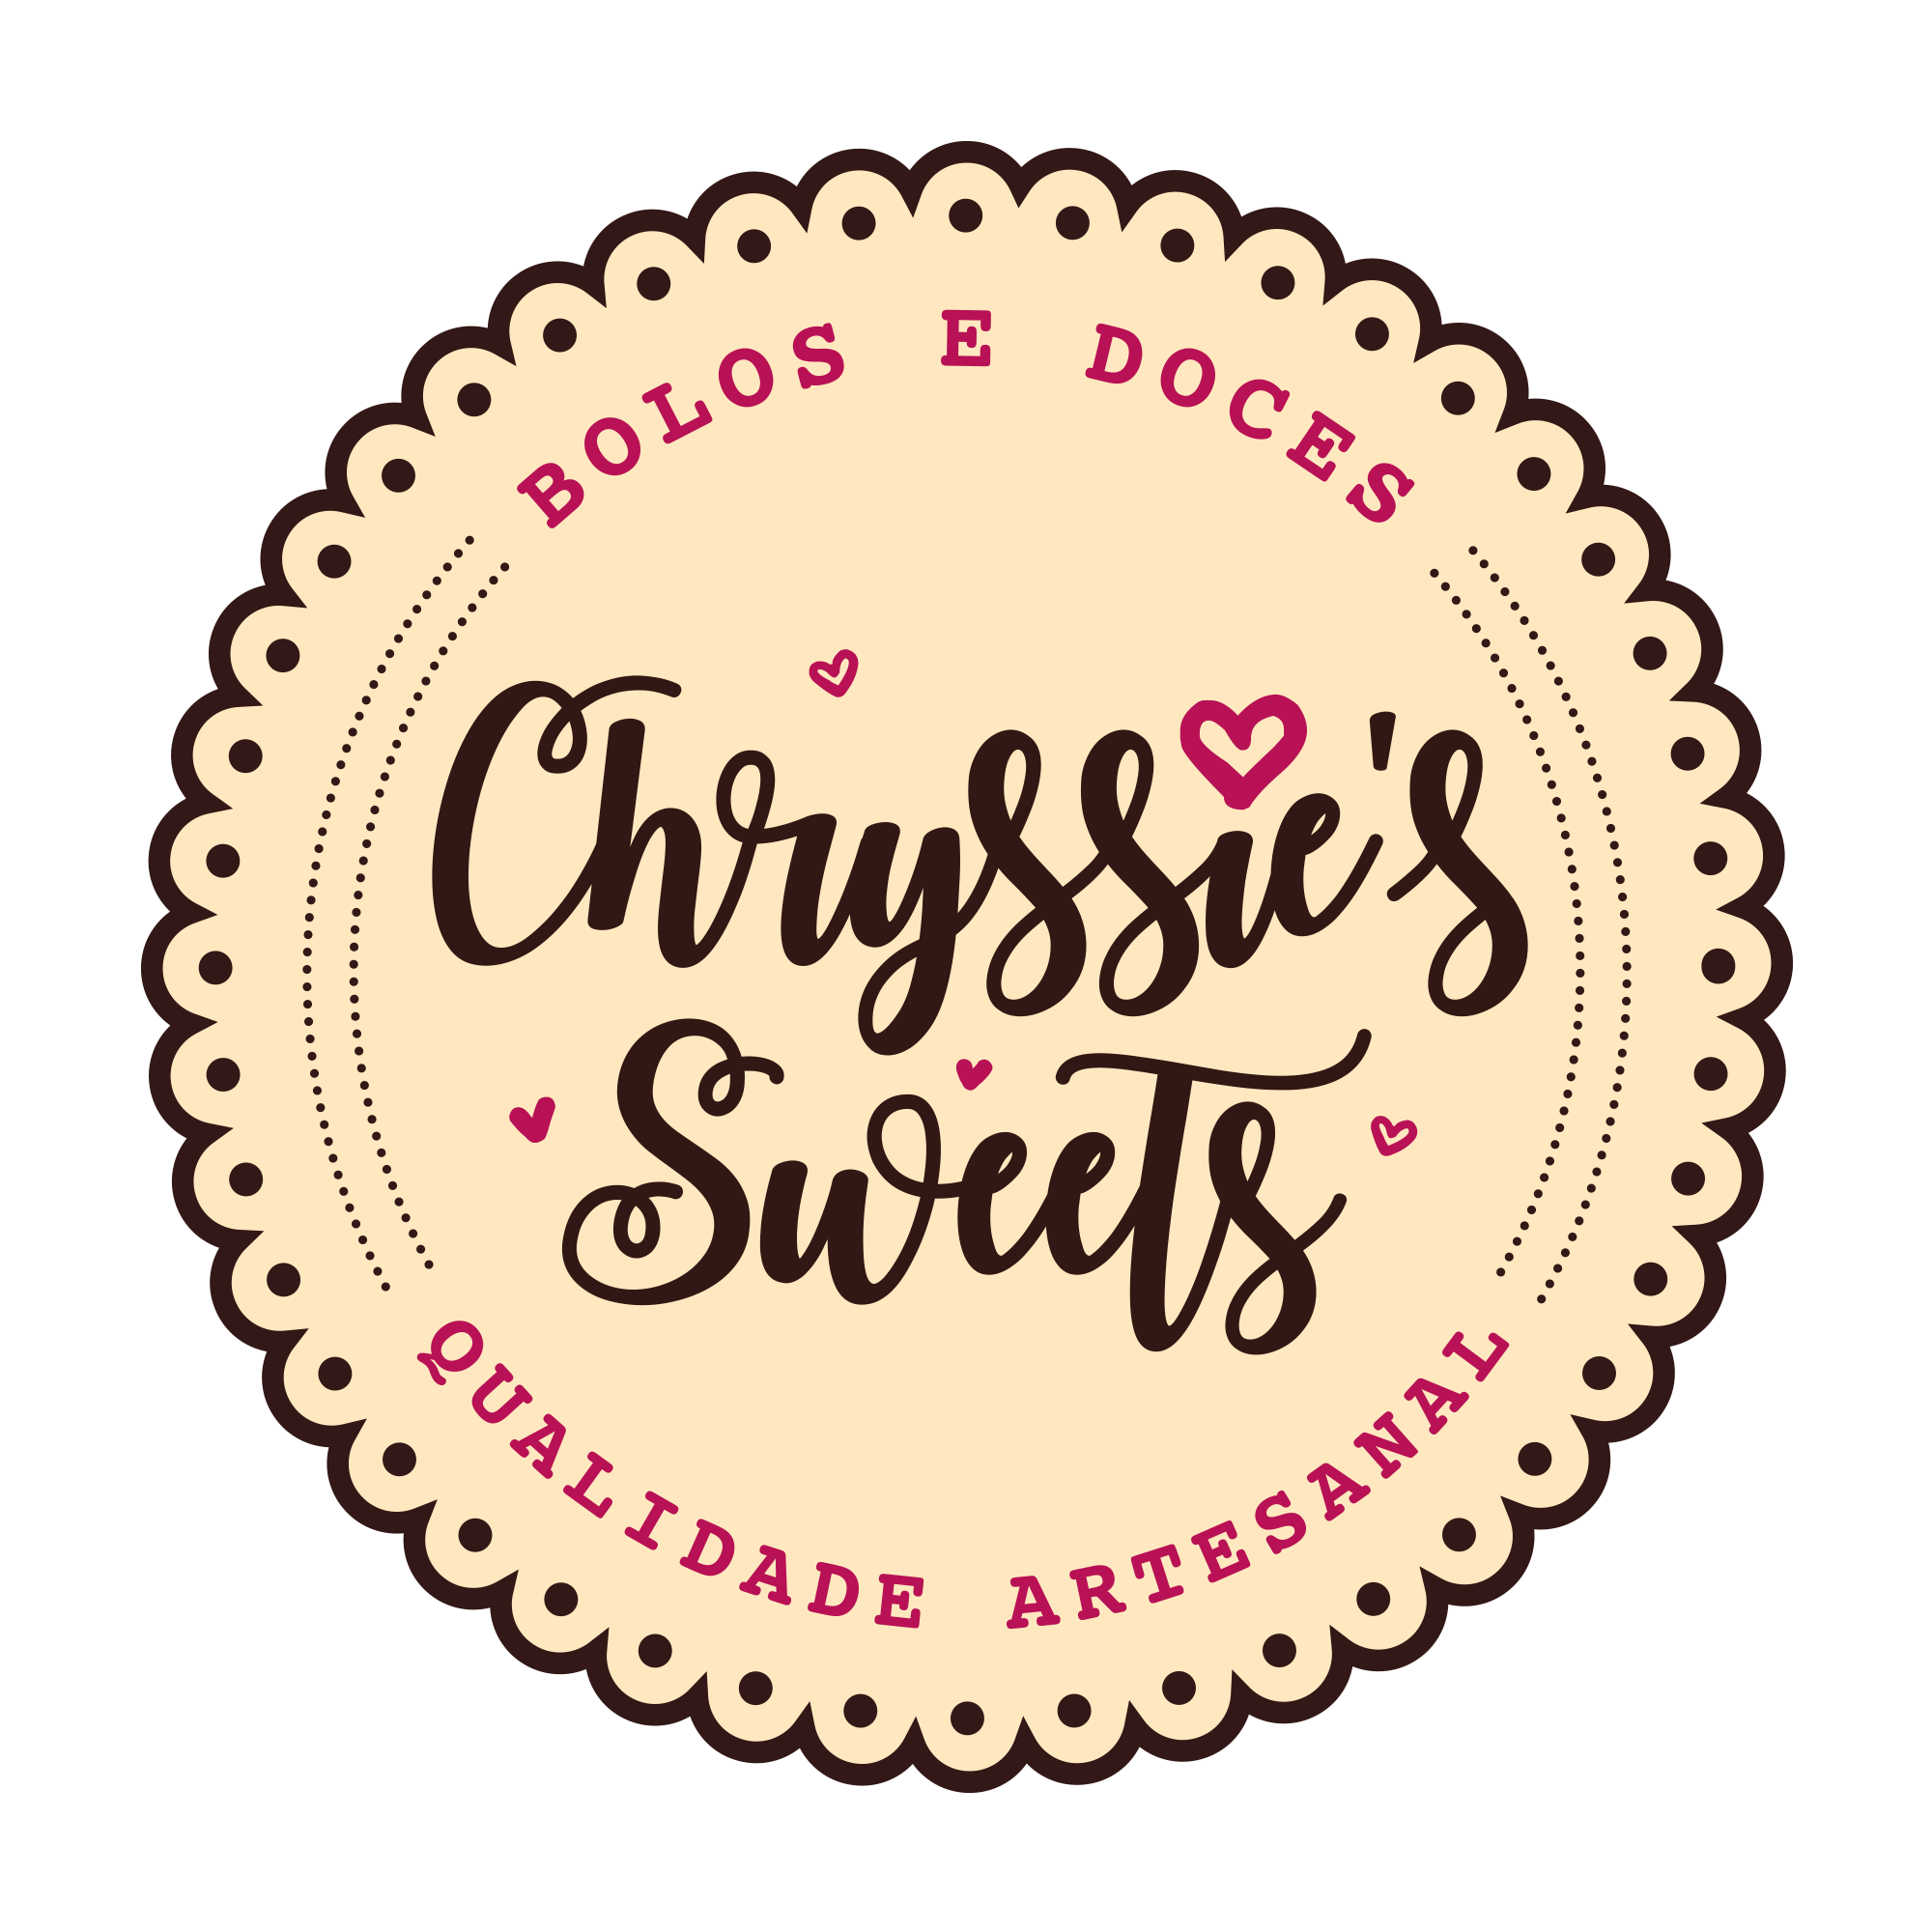 Chryssie's Sweets   Festival Gastronômico UPV 2019